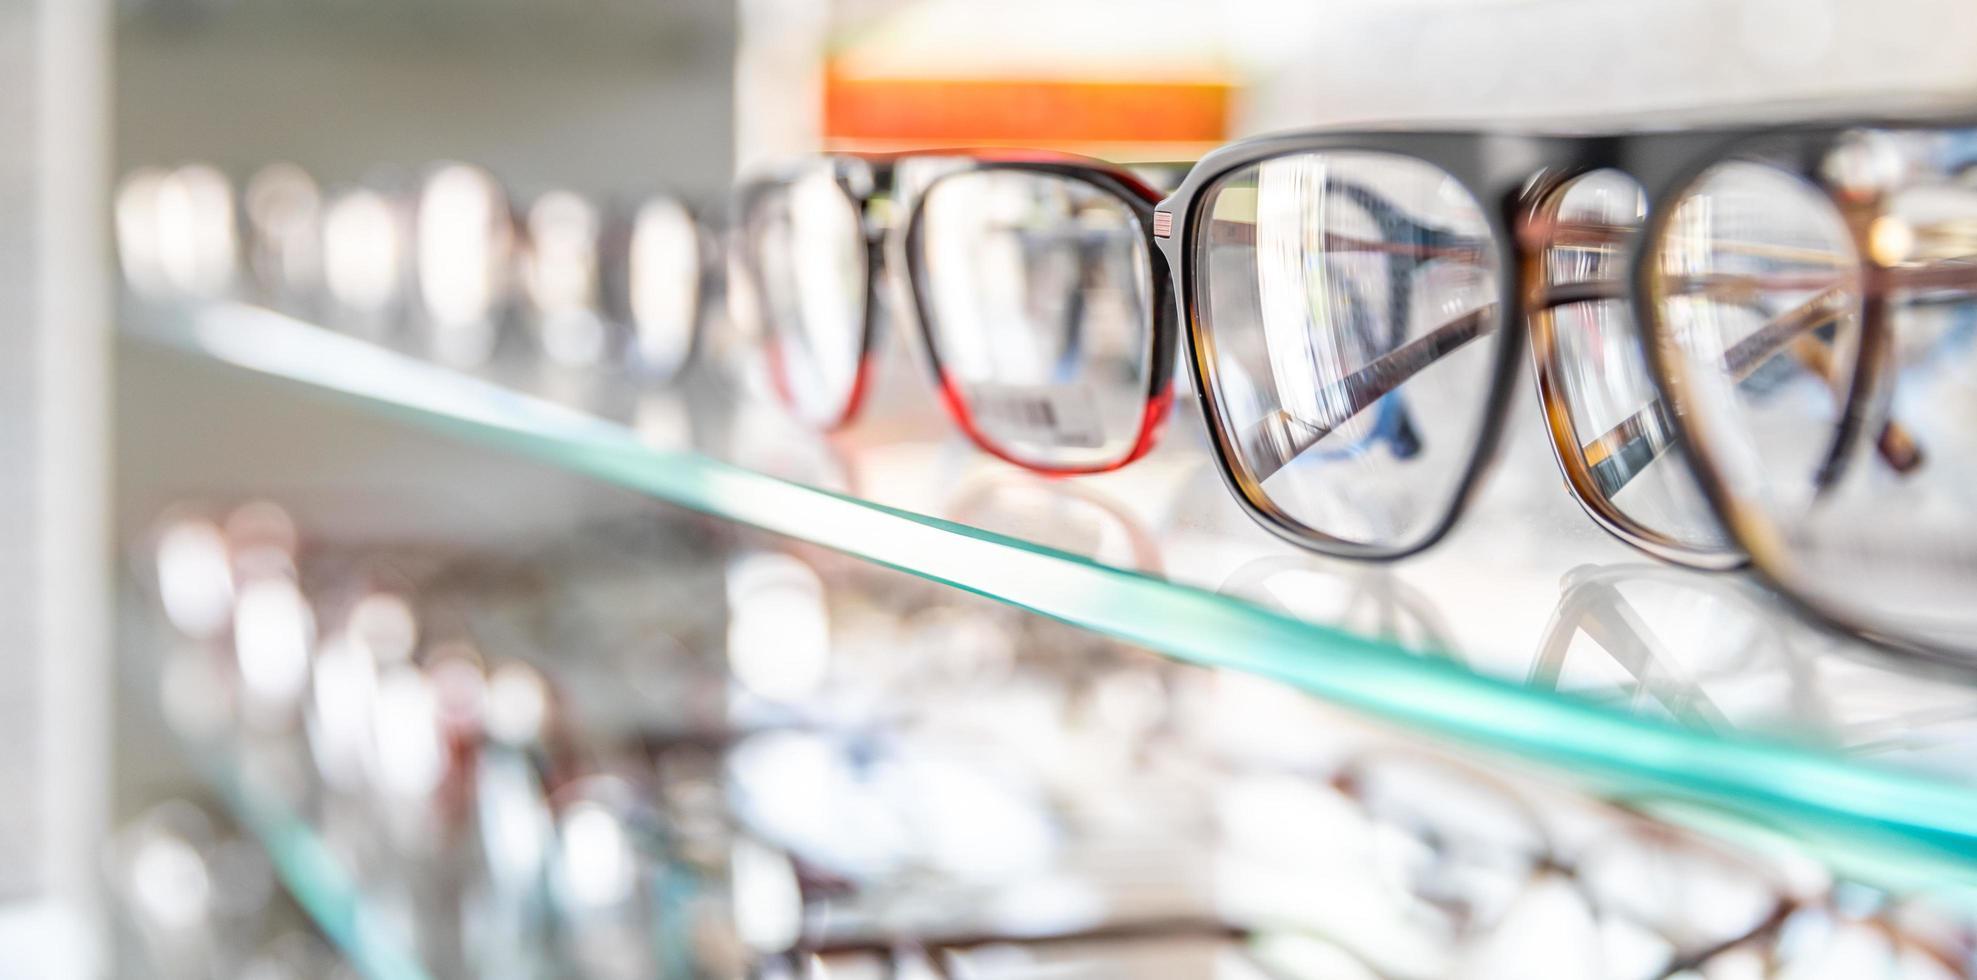 lenzenvloeistof vitrine met dioptrische bril foto